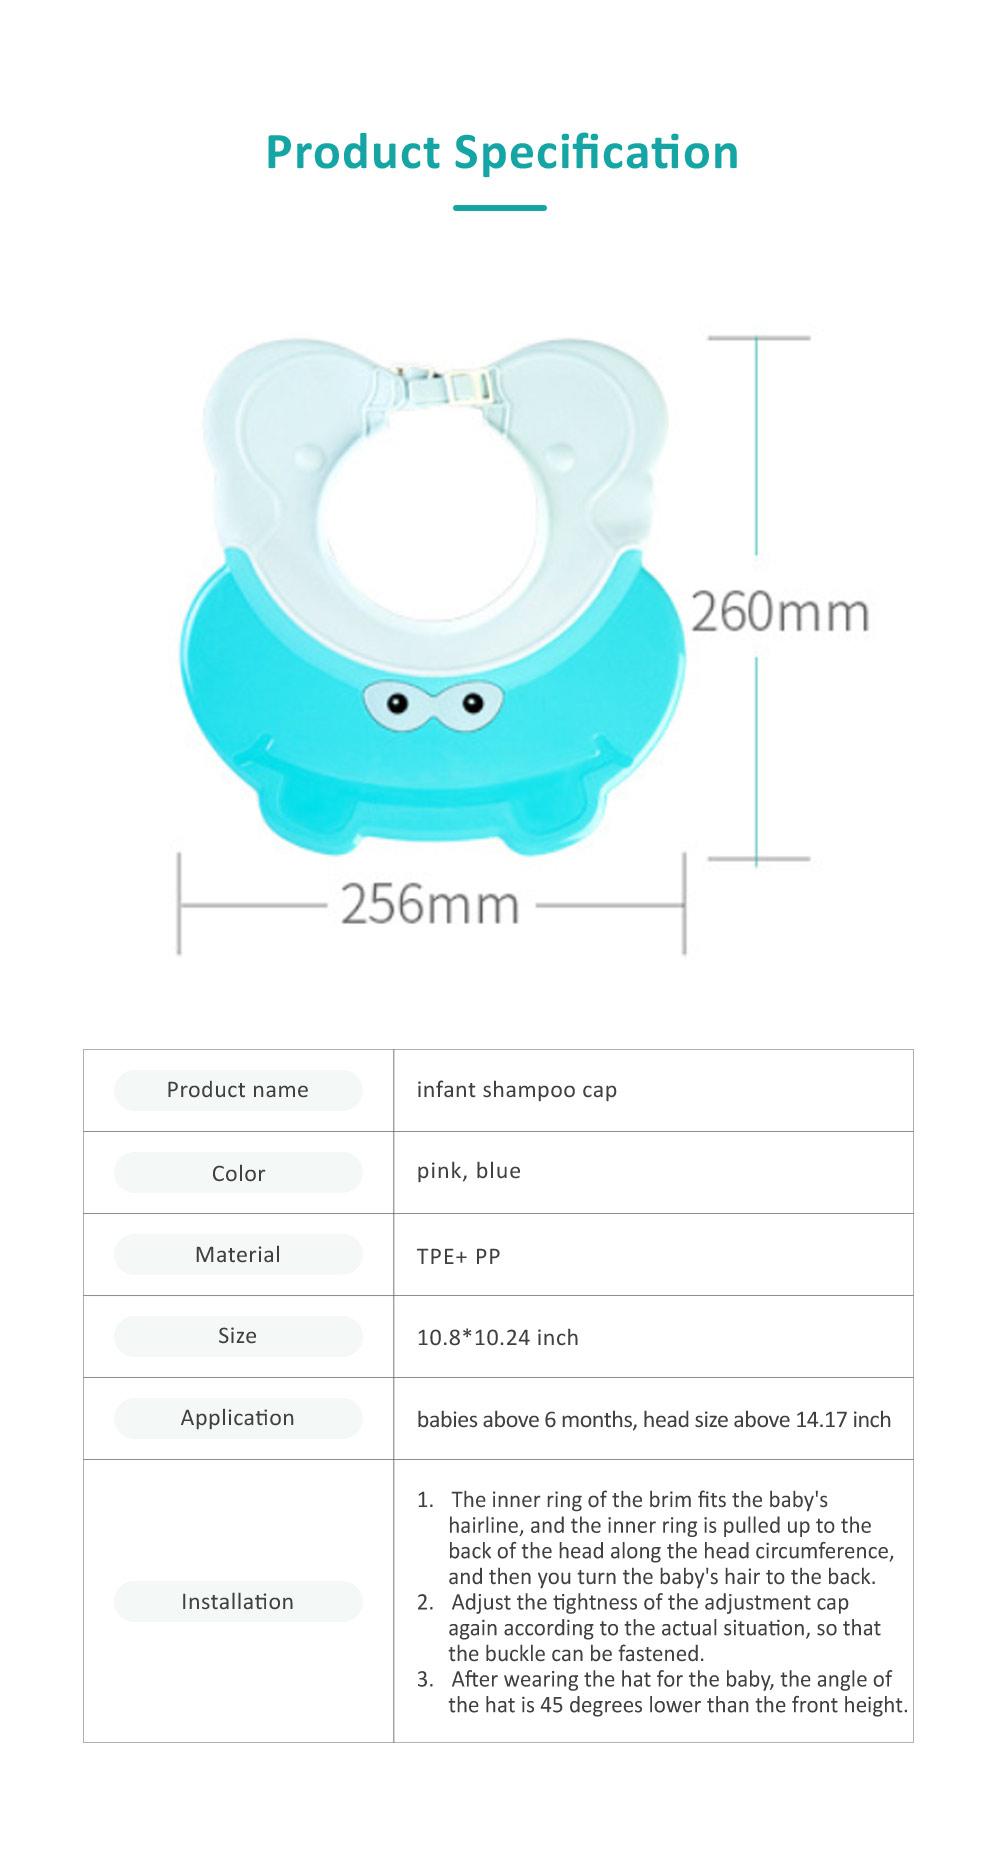 Animal Model Baby Shampoo Cap, Ultra-soft Elastic Ears Eyes Mouth Protection Shower Hat for Infants Shampoo Cap 6